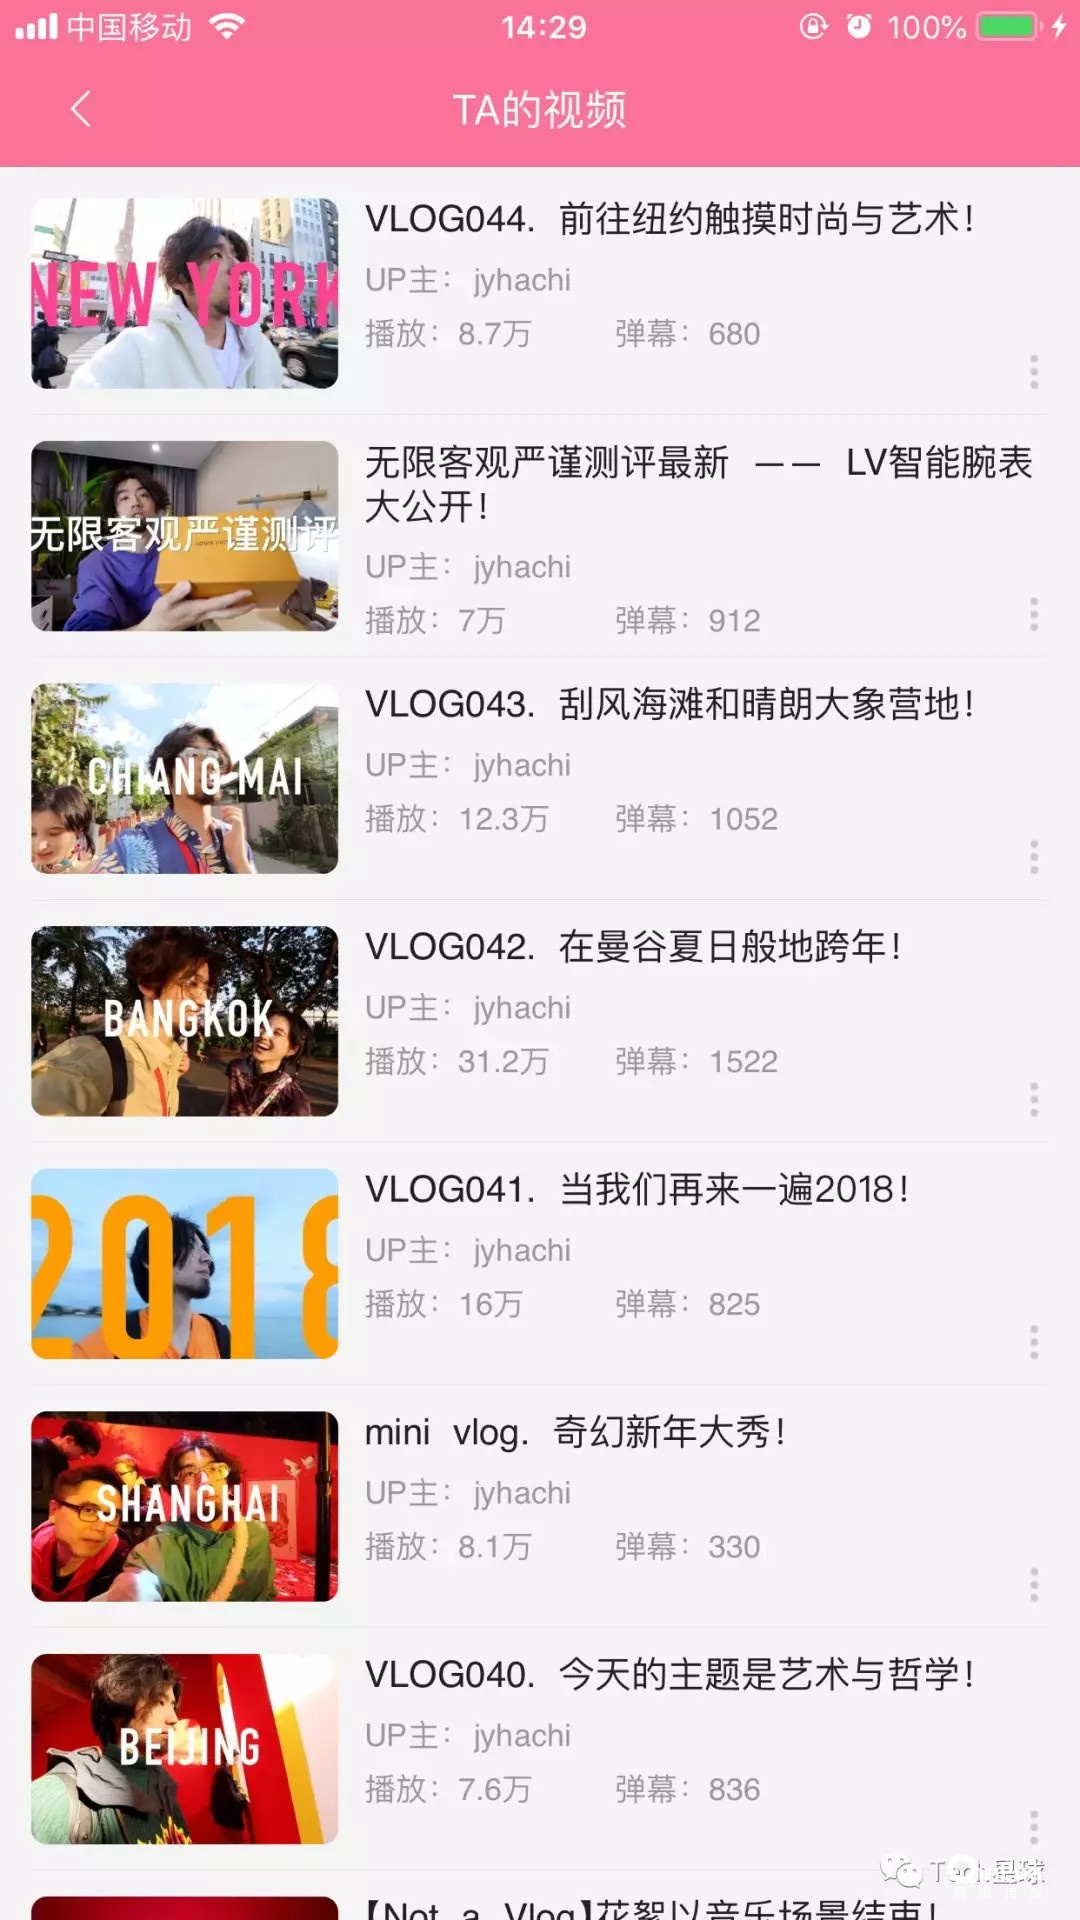 <a href='http://mcnjigou.com/?tags=3'>抖音</a>、B站、<a href='http://mcnjigou.com/?tags=5'>微博</a>发力Vlog!什么是Vlog?